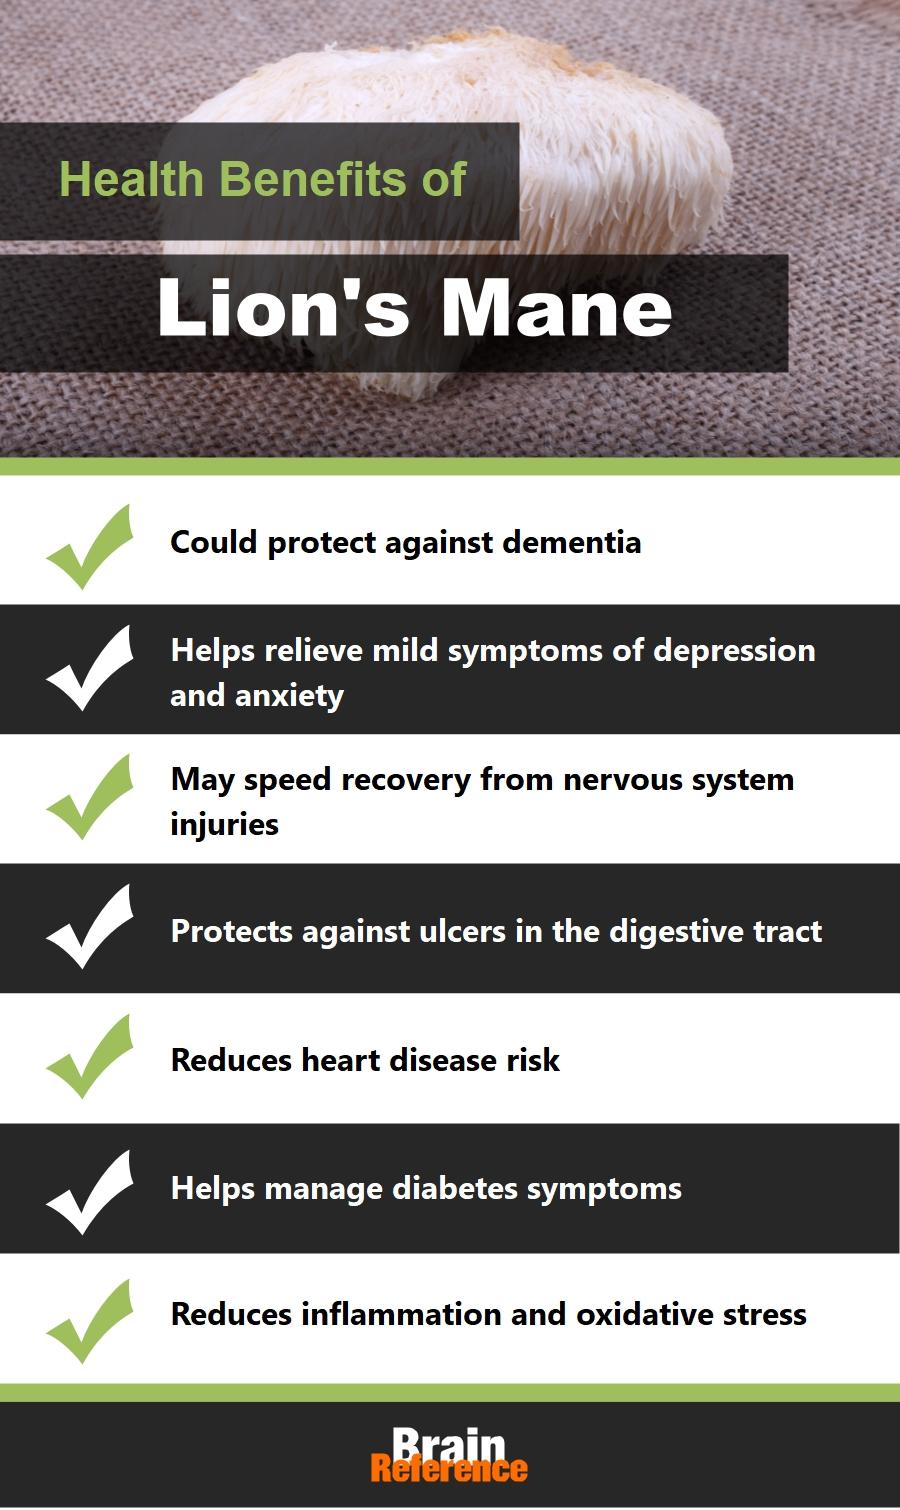 Lions-Mane-Dr.Emil-Nutrition-Health-Benefits-of-Lions-Mane